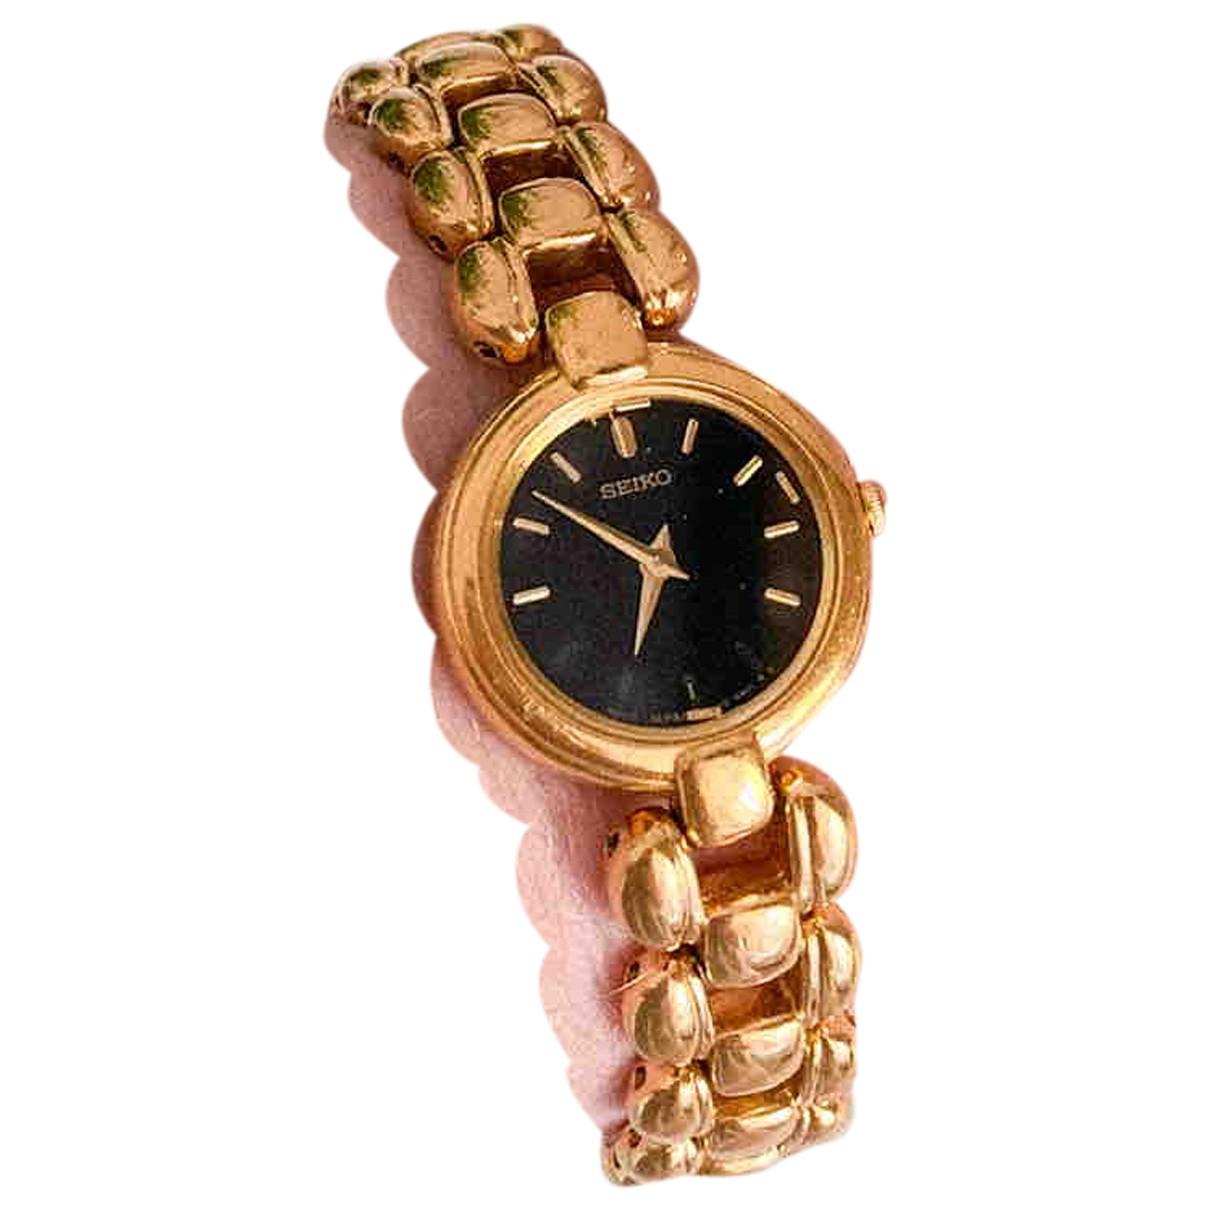 Seiko N Gold Steel watch for Women N